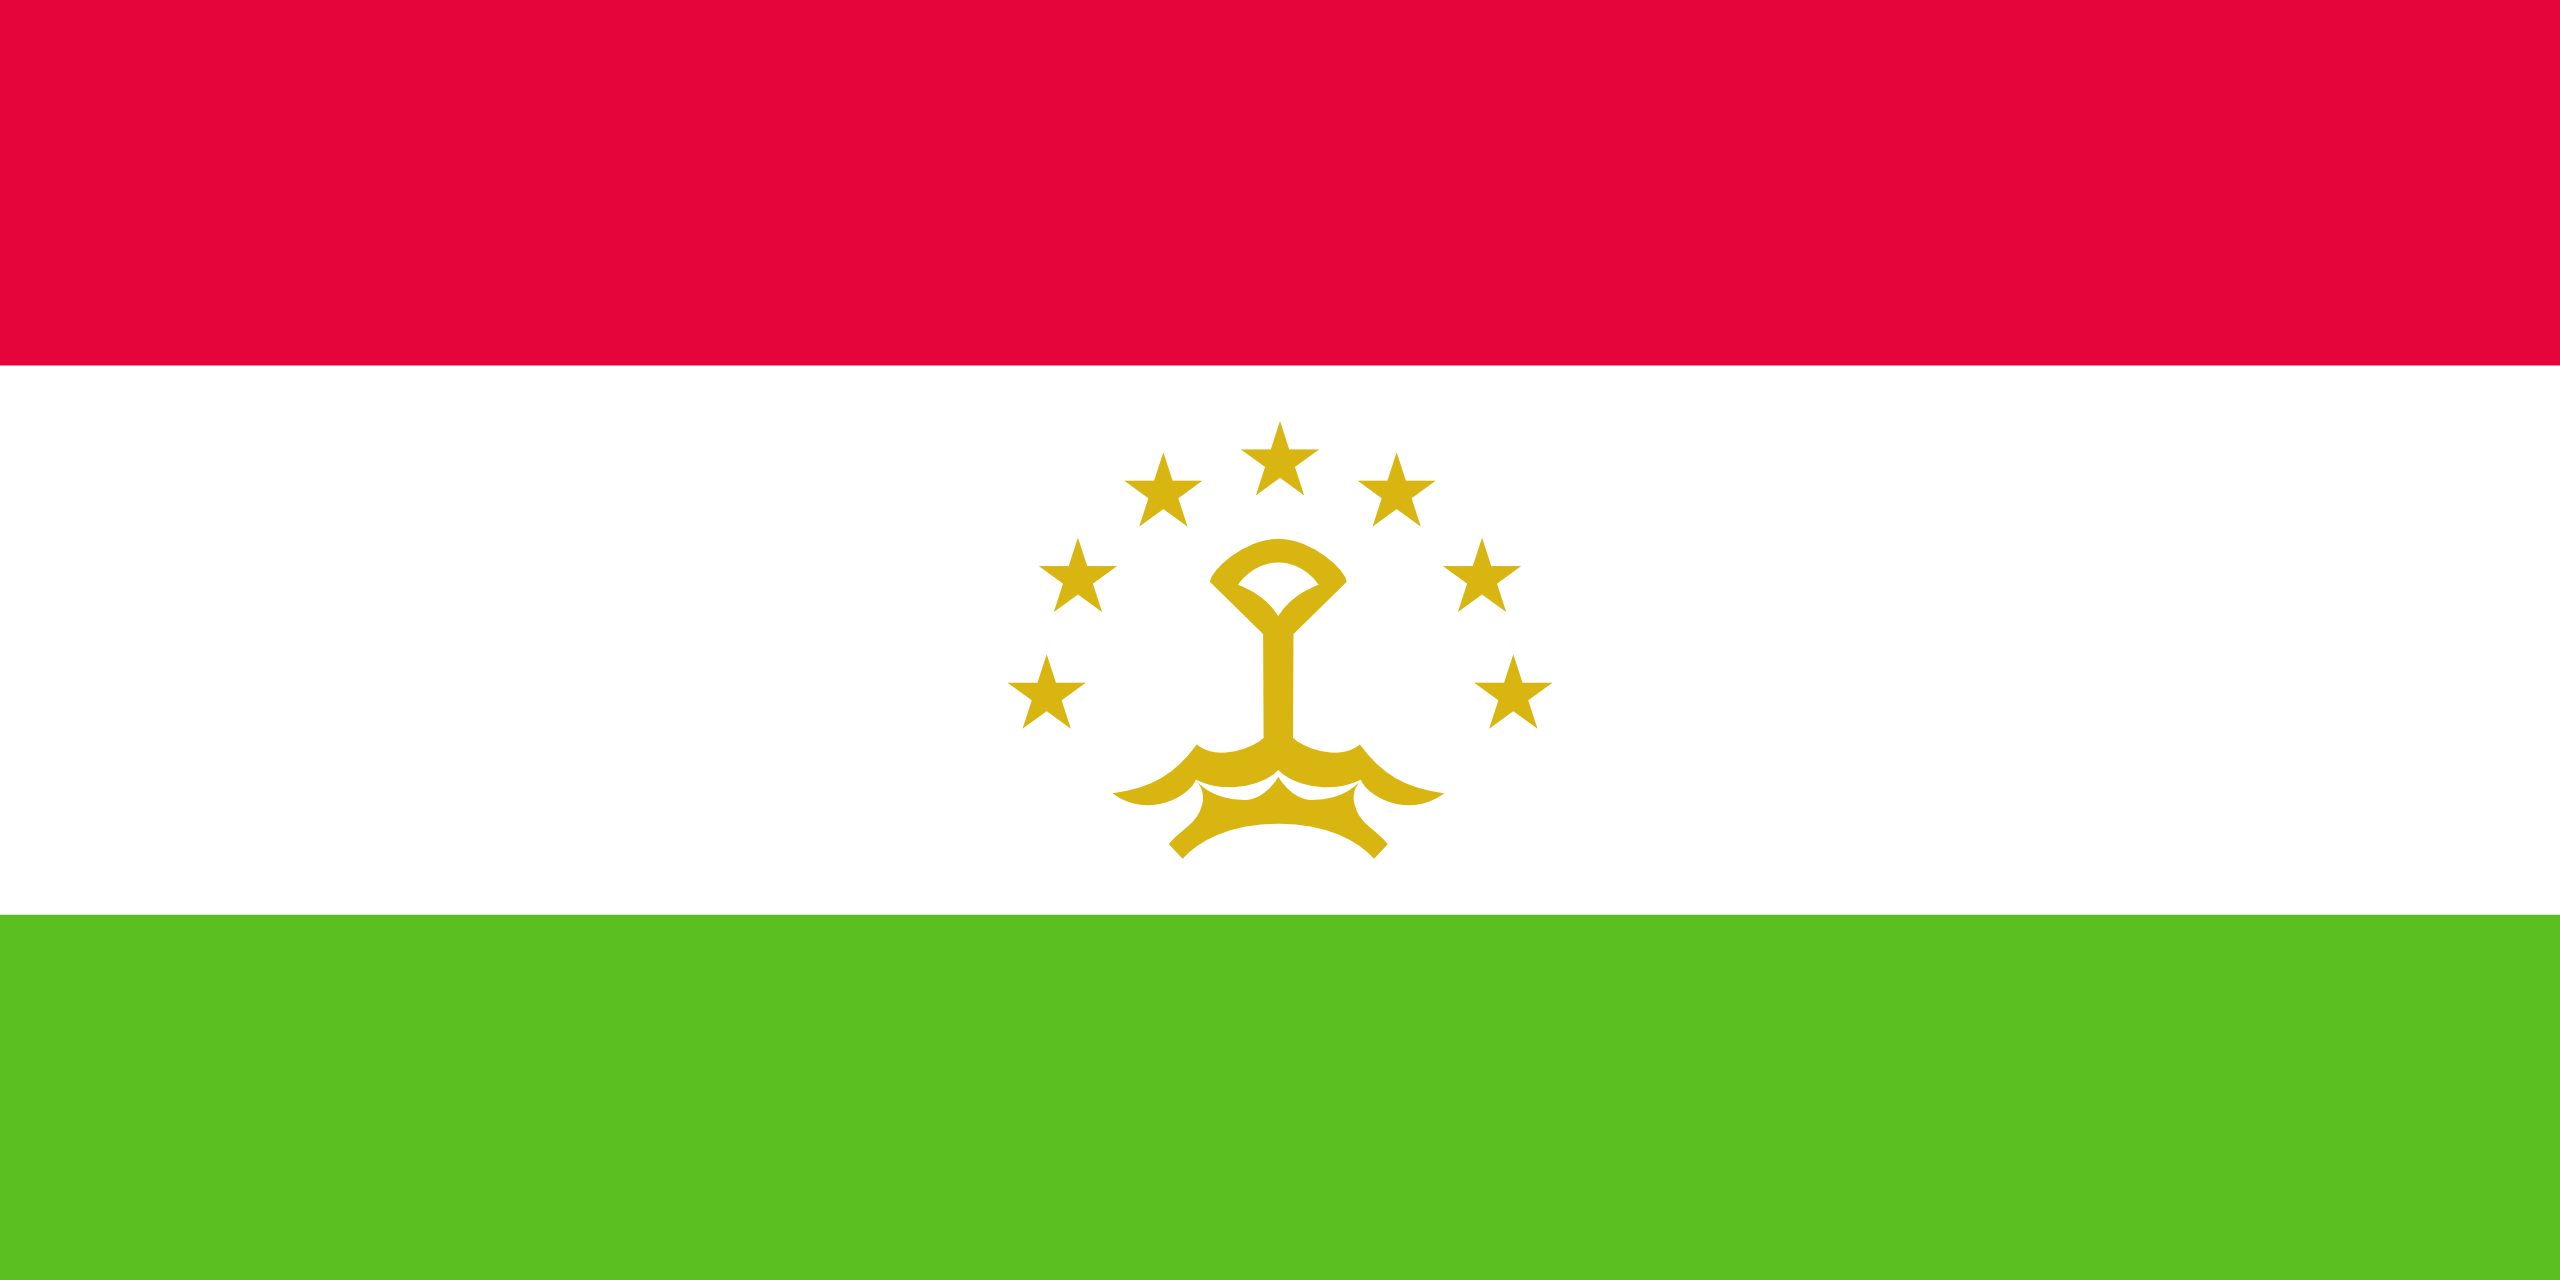 tayikistán, país, emblema, insignia, símbolo - Fondos de Pantalla HD - professor-falken.com